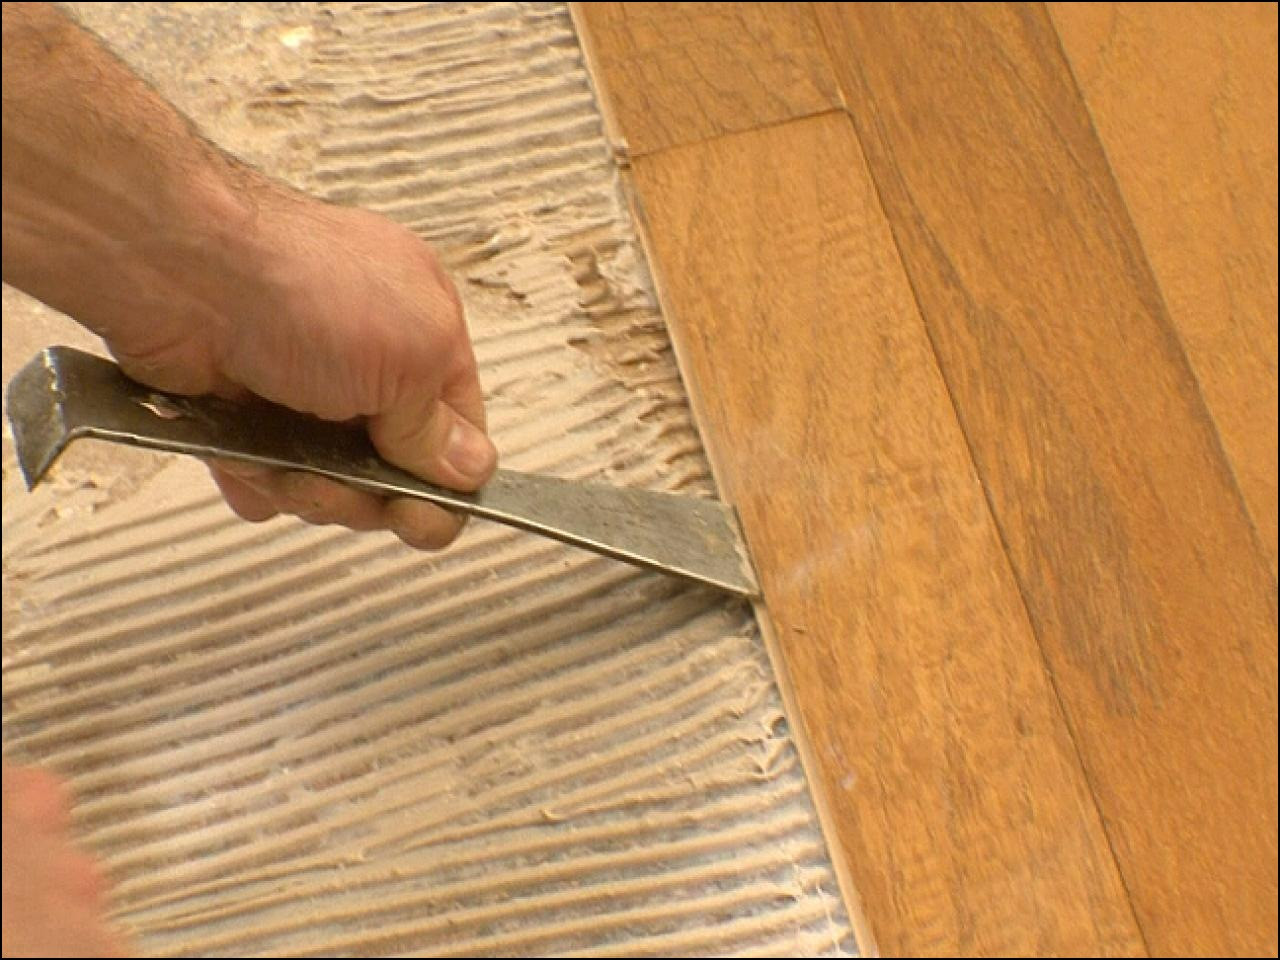 hardwood wood floor installation flooring jack of best place flooring ideas for best place to buy engineered hardwood flooring average cost engineered wood flooring per square foot flooring